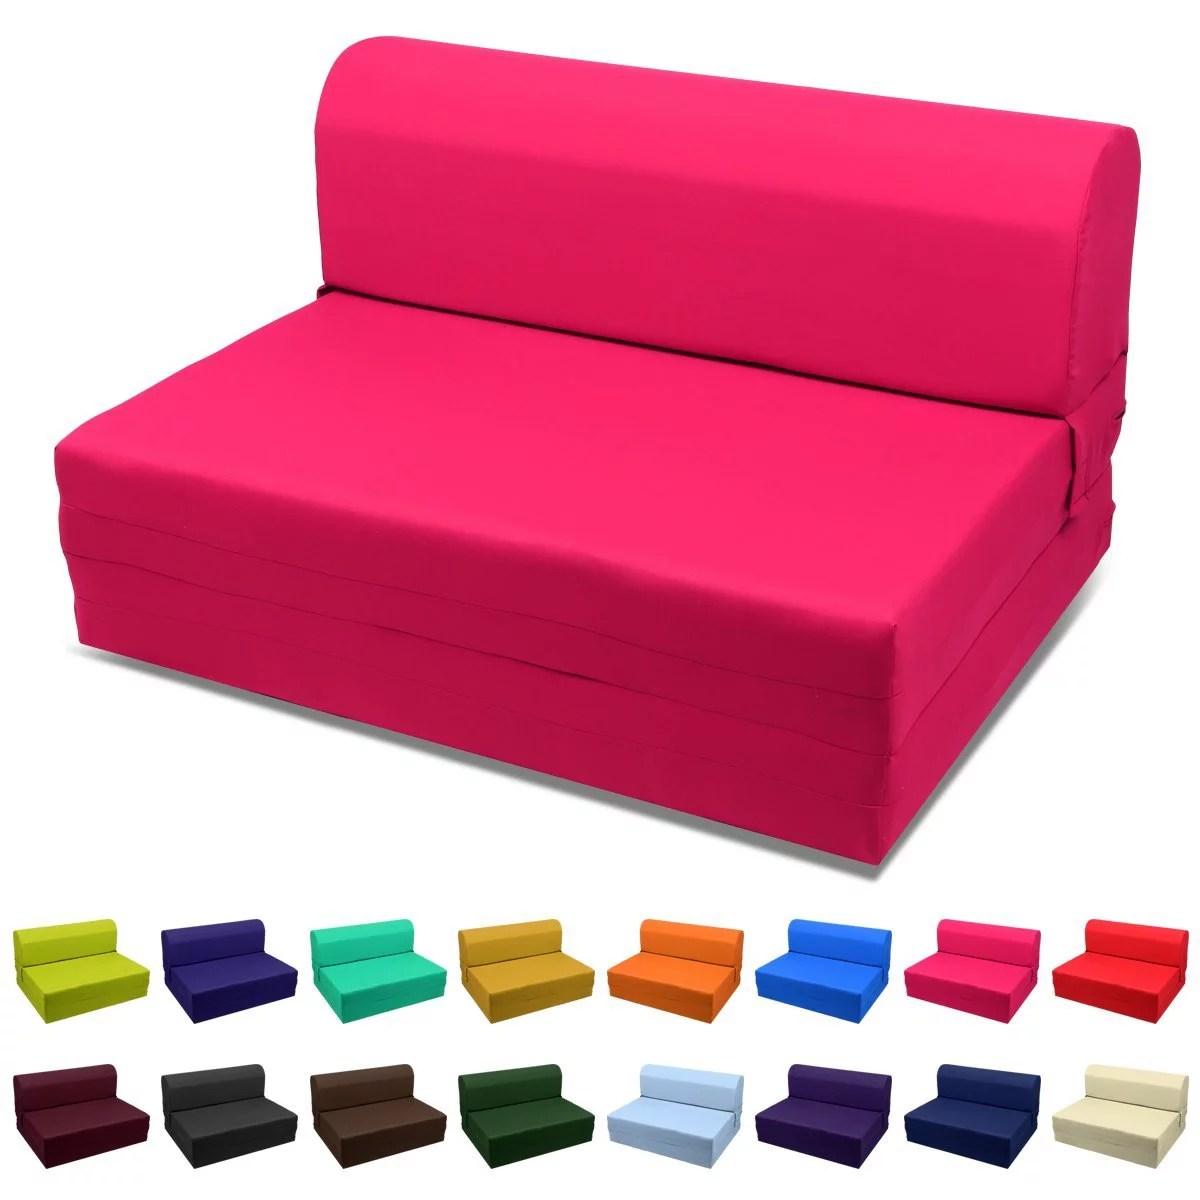 sleeper chair folding foam bed full size wheelchair lift for sale magshion sized 5x46x74 inch purple walmart com